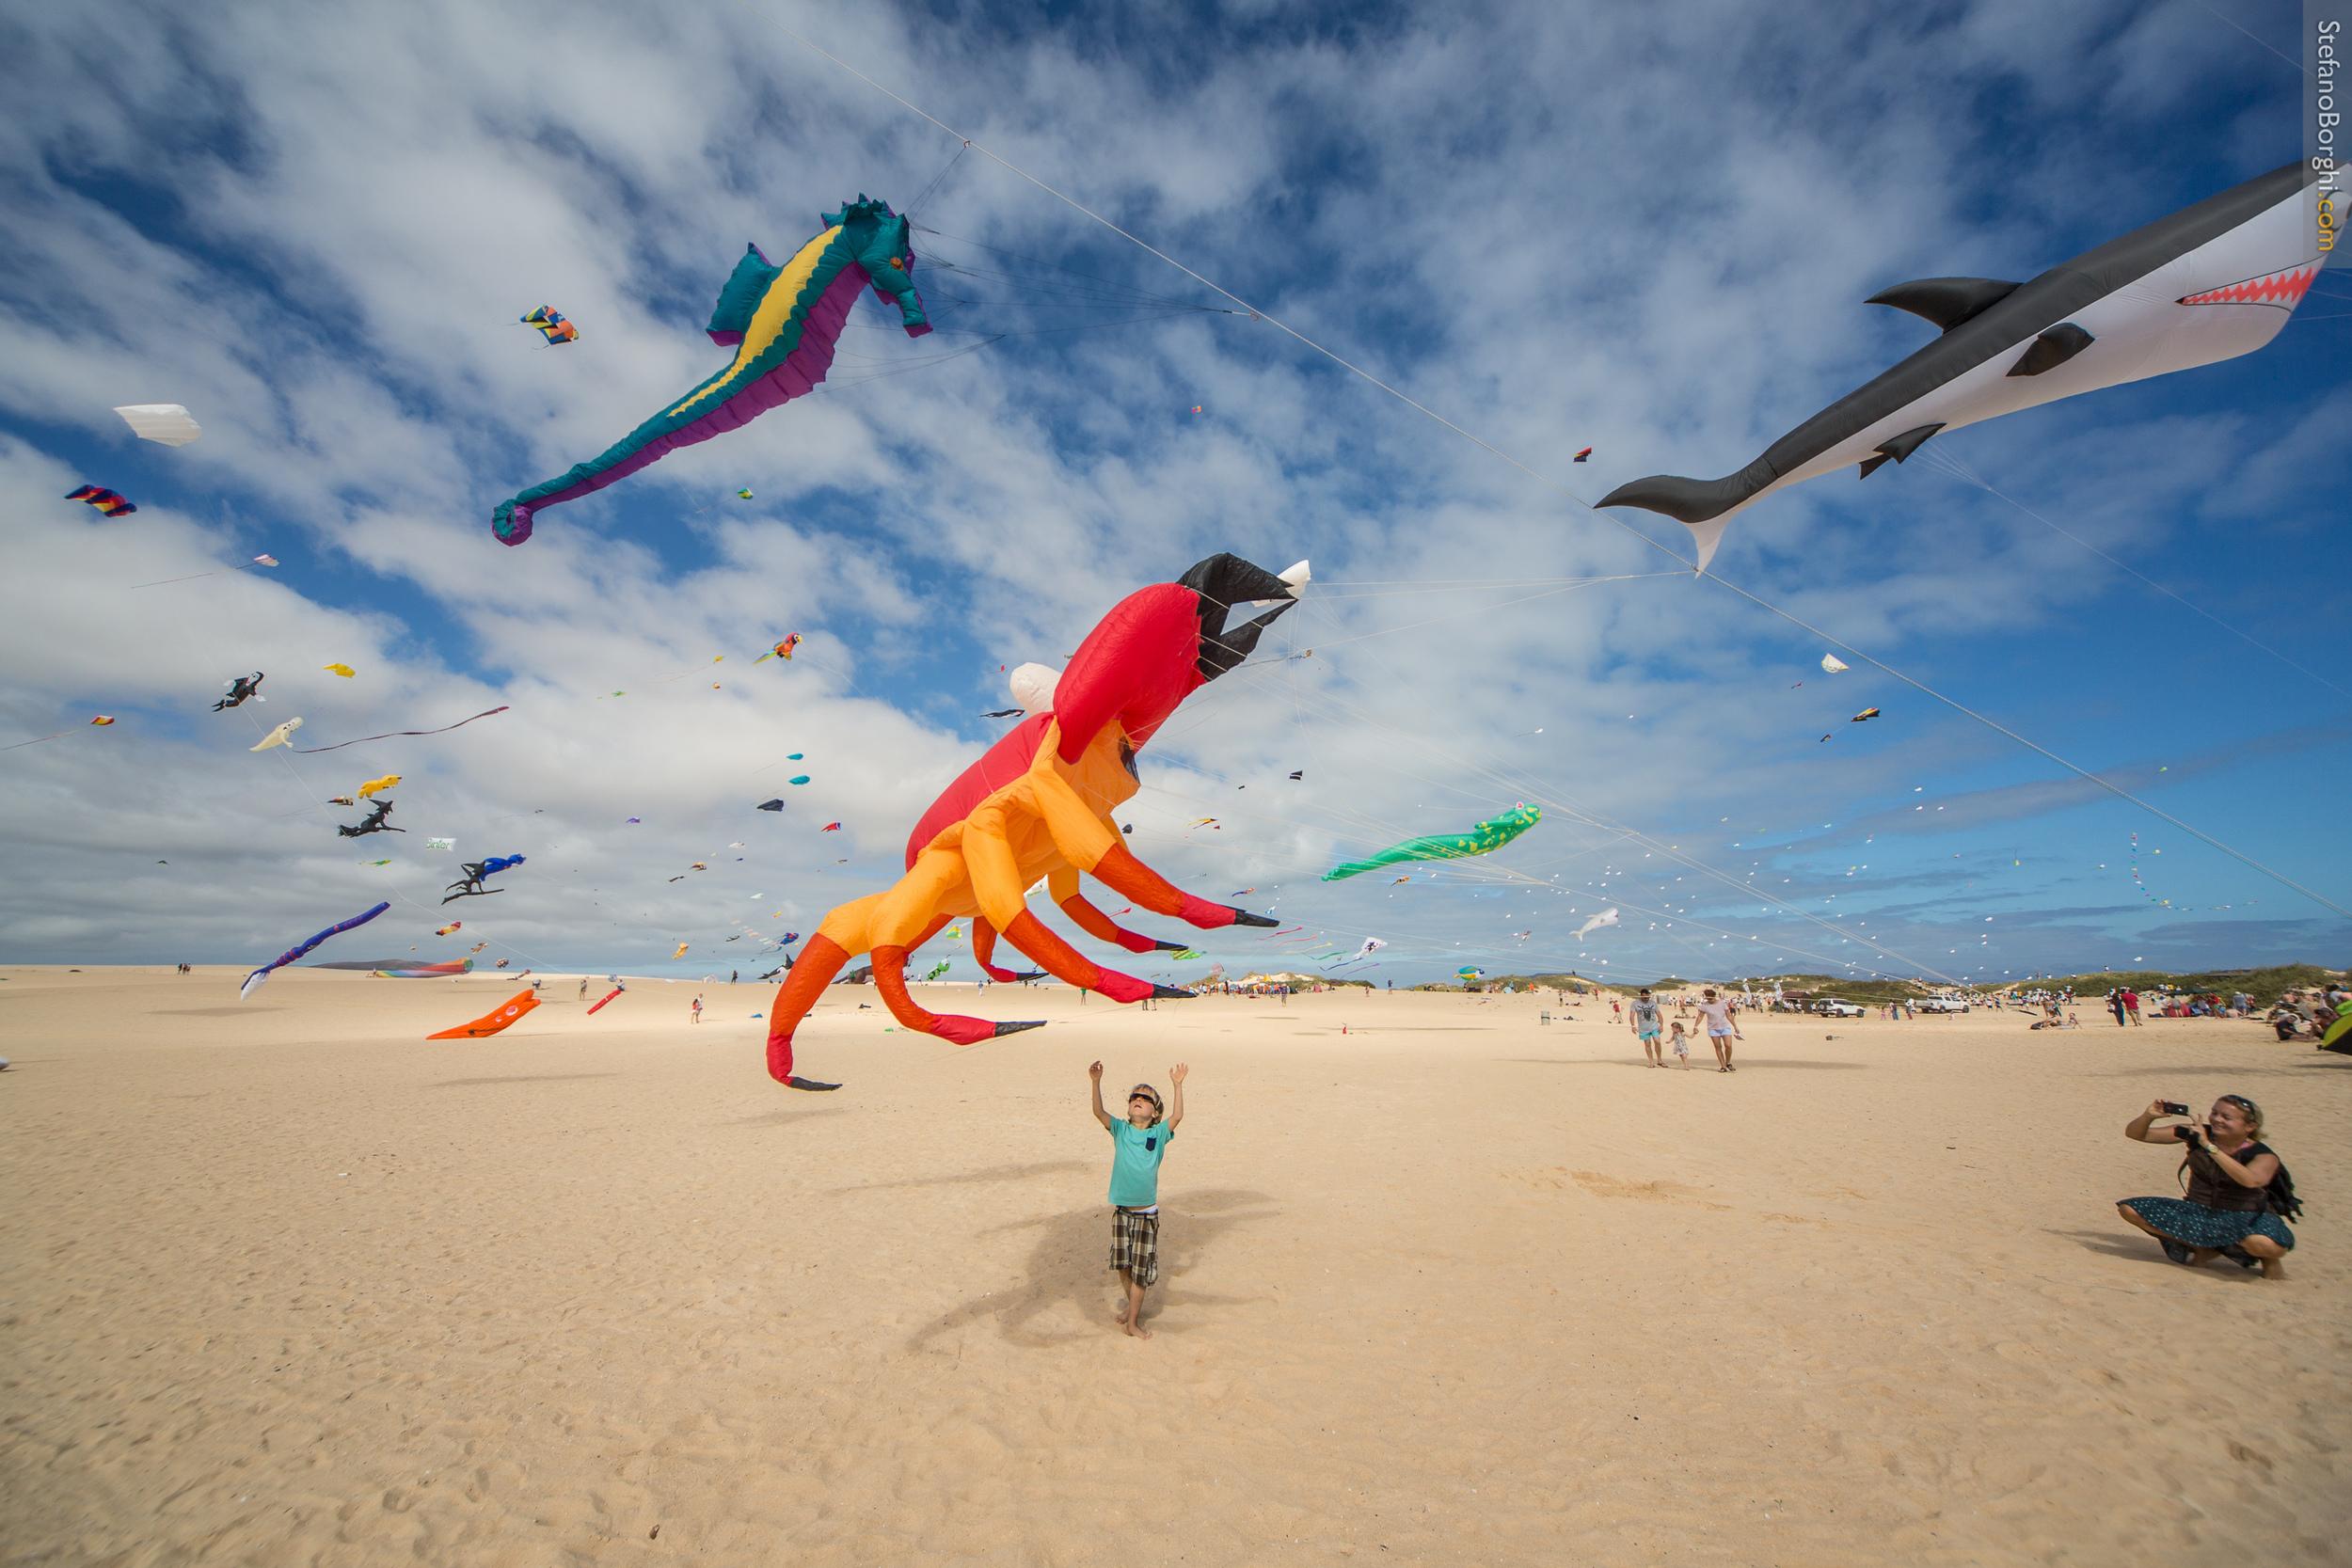 kite festival on the dunes of corralejo